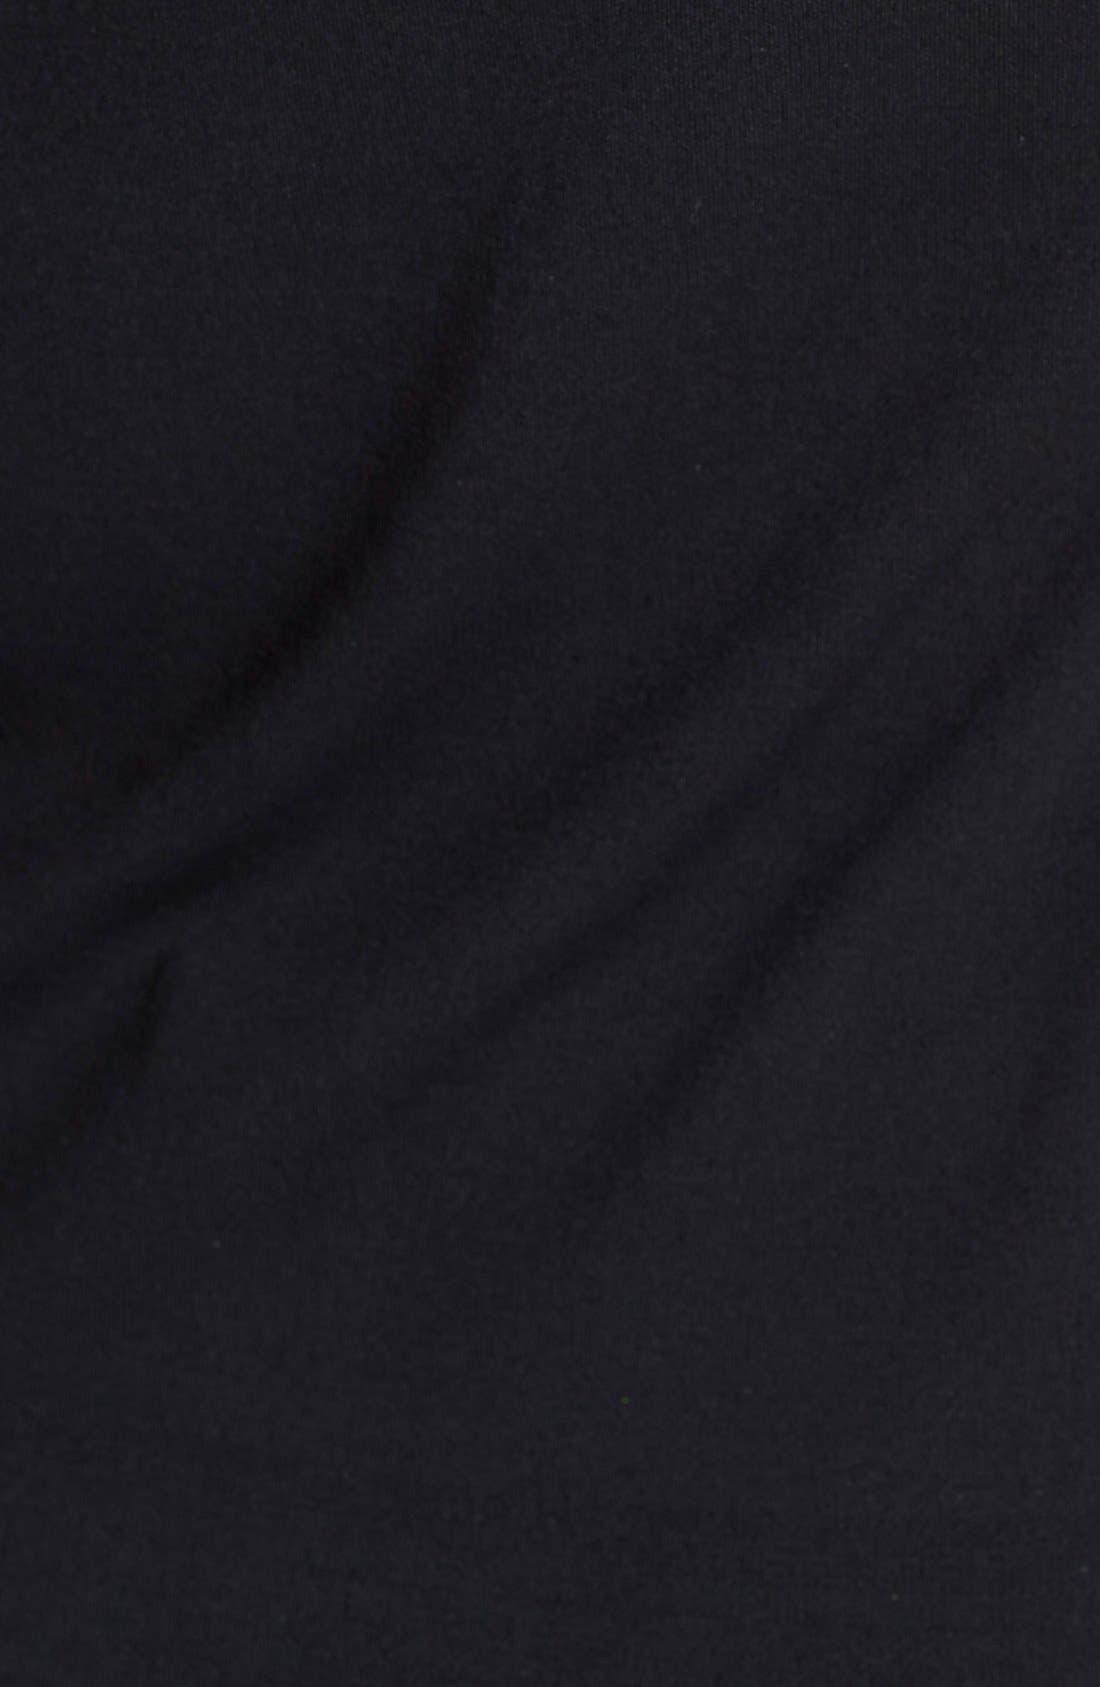 Scoop Neck Silk Camisole,                             Alternate thumbnail 9, color,                             001